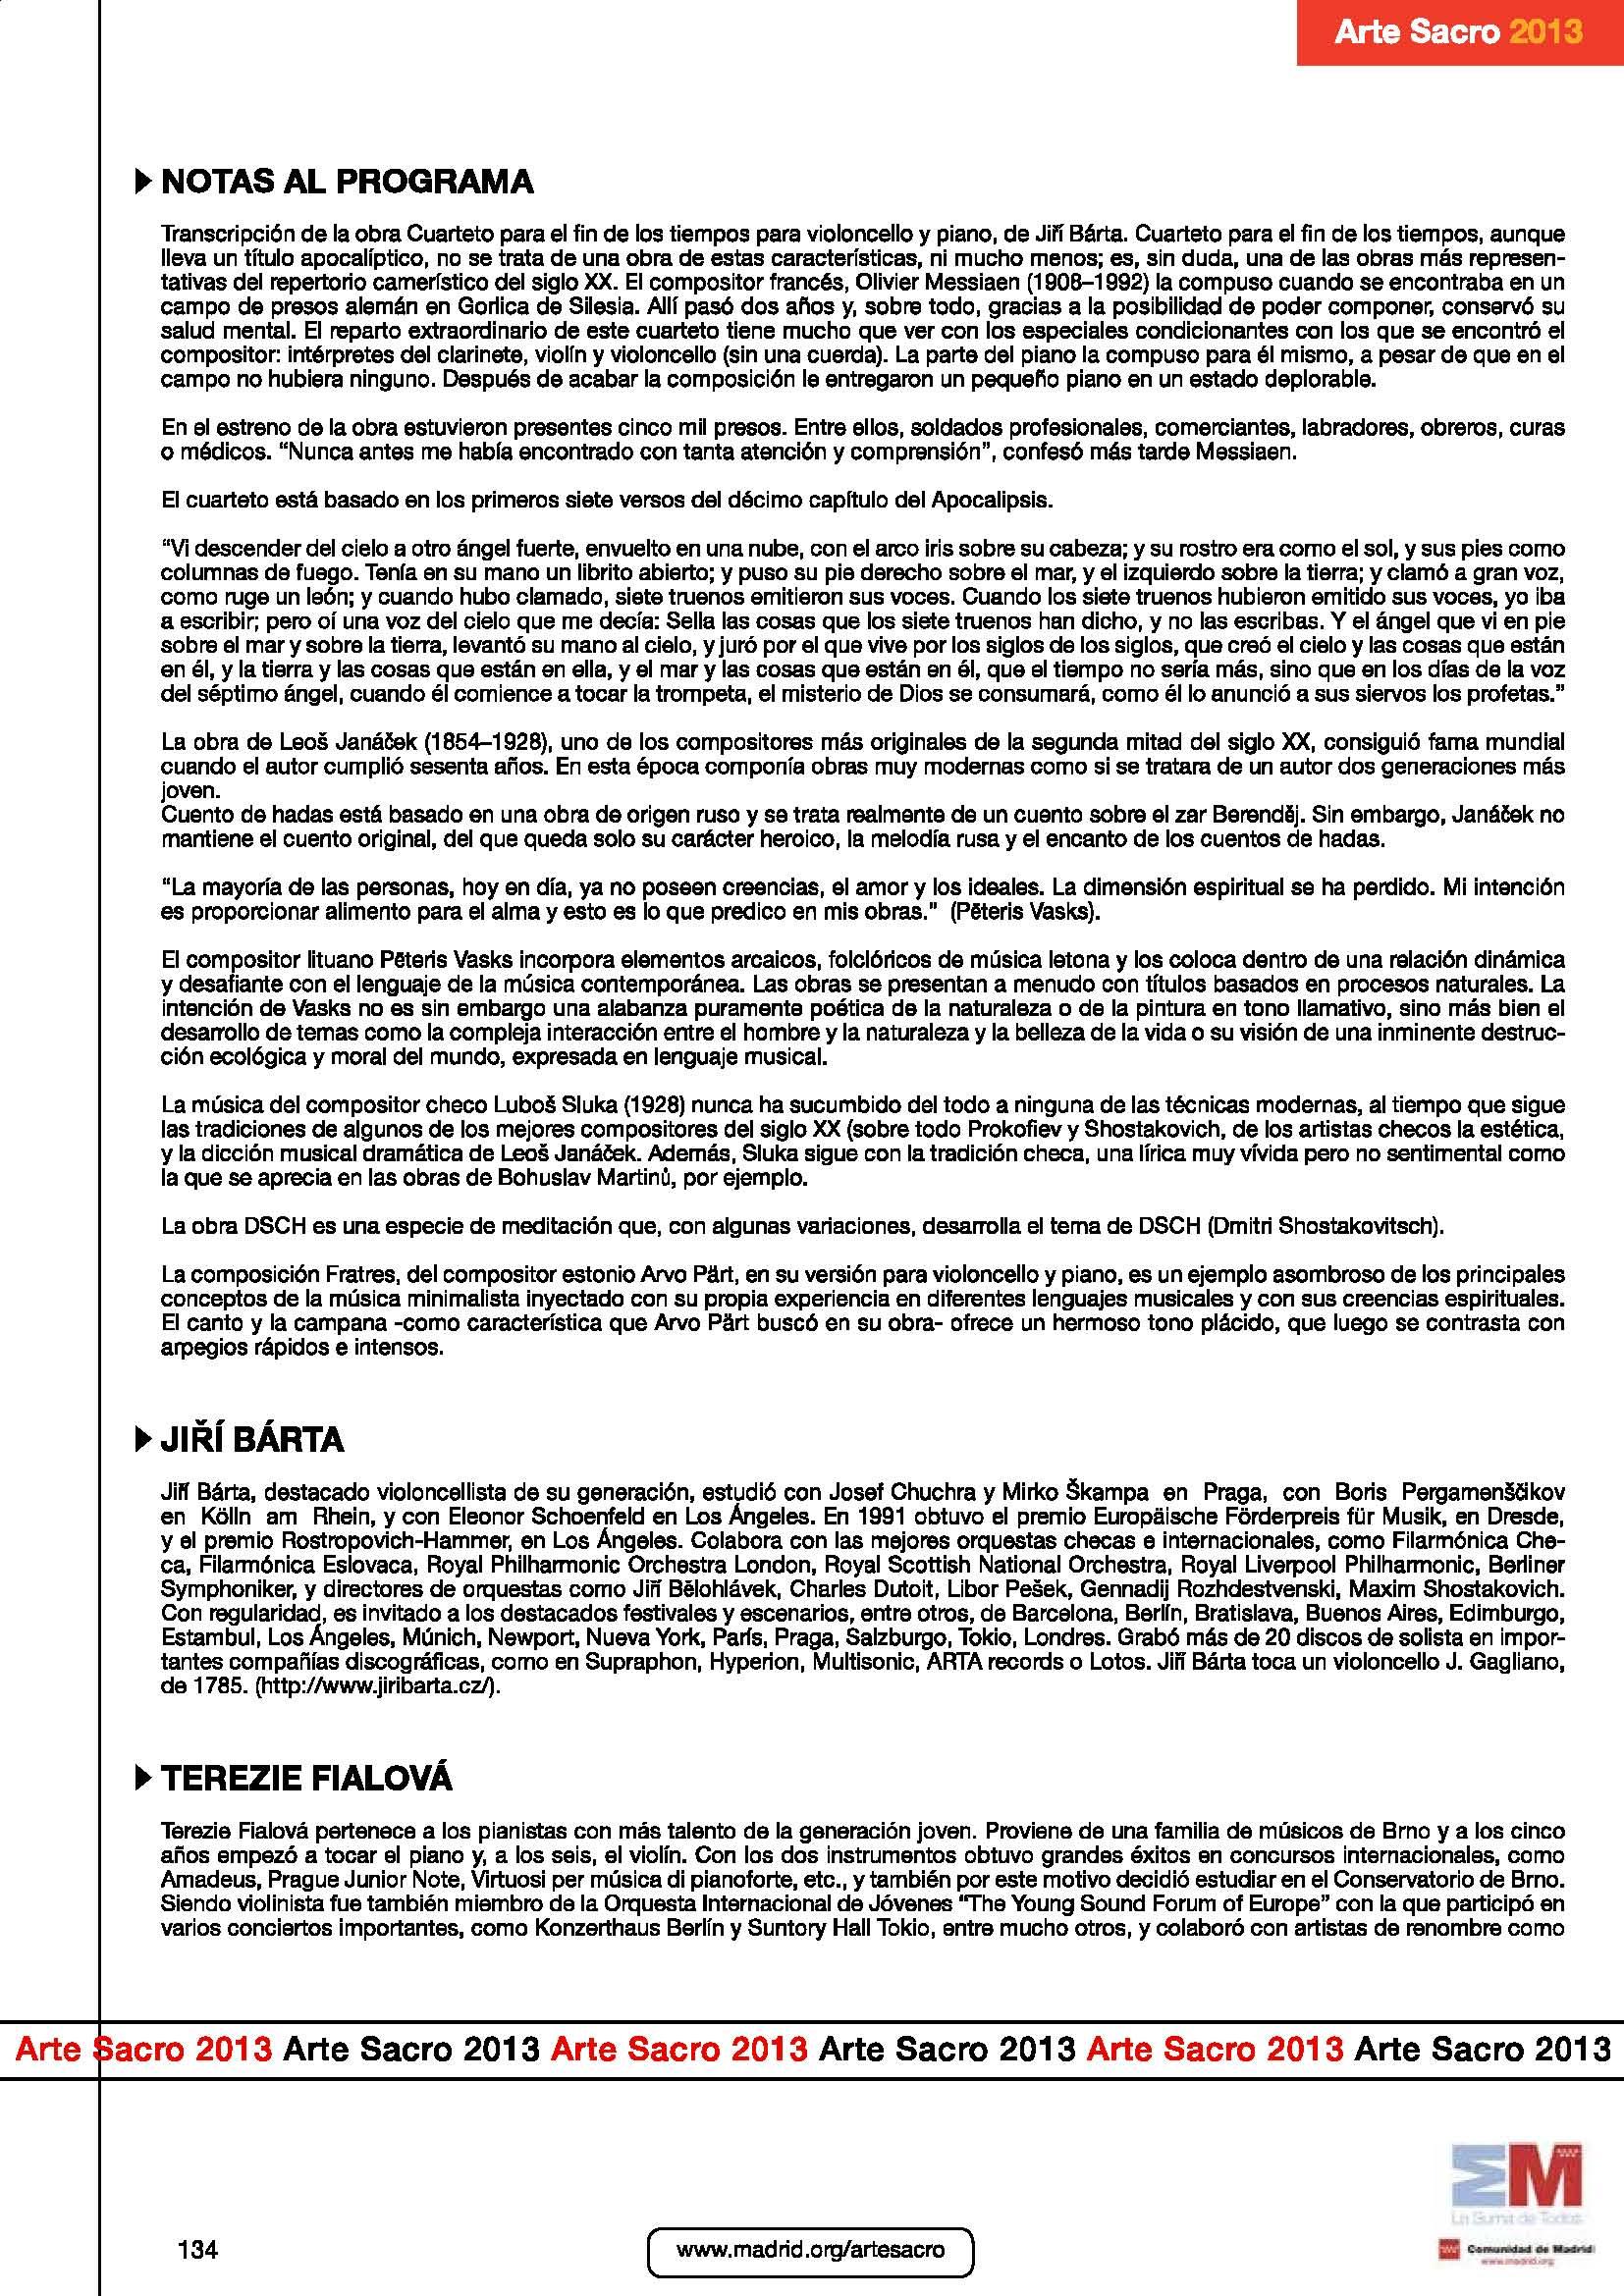 dossier_completo_Página_134